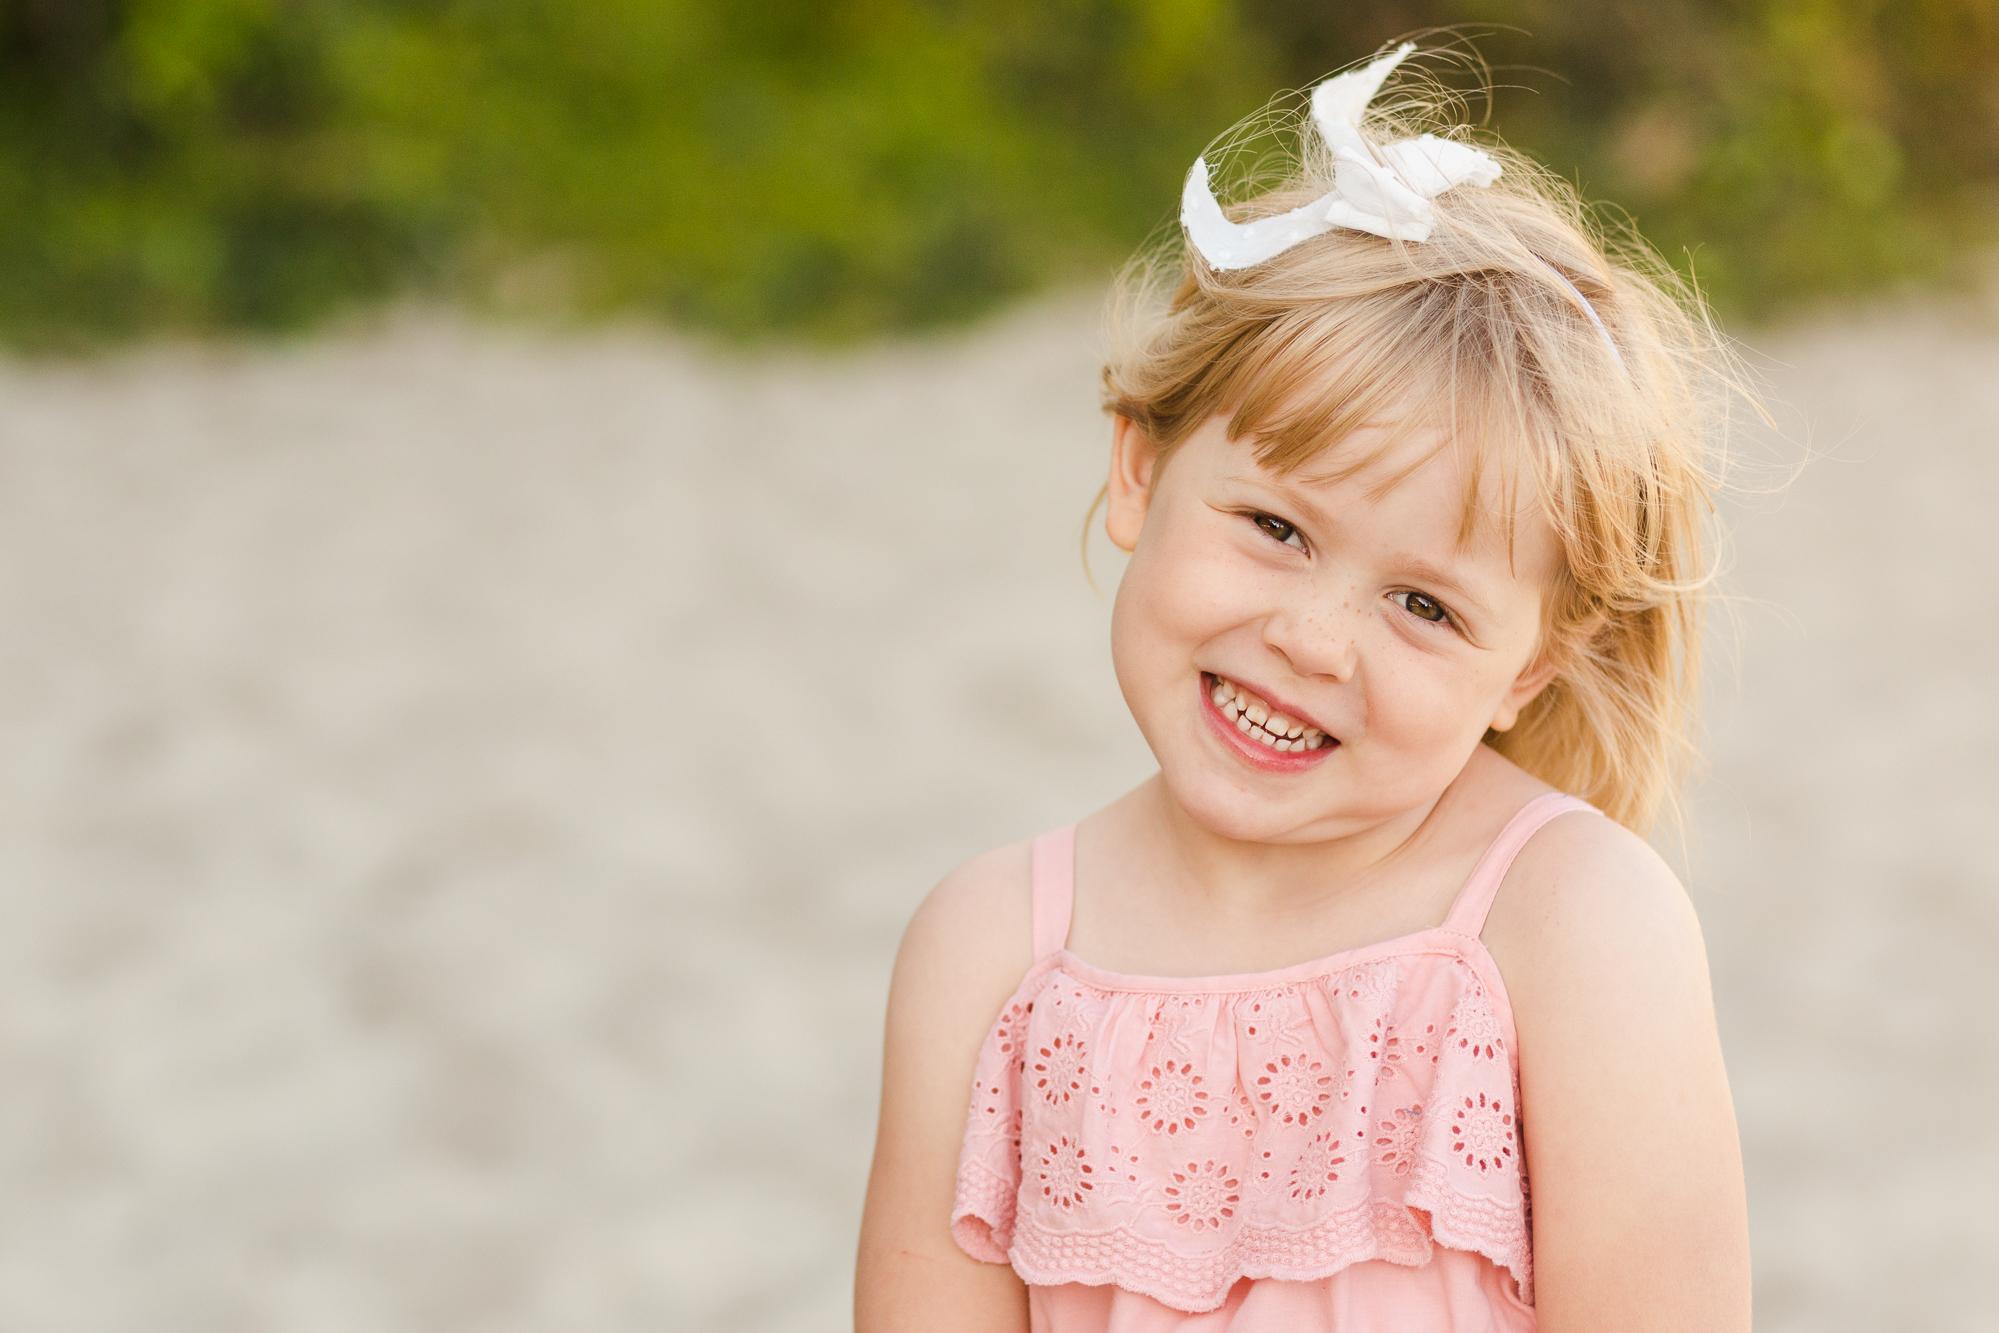 San-Diego-Family-Photographer-Christine-Dammann-Pacific-Beach-Green-4.jpg